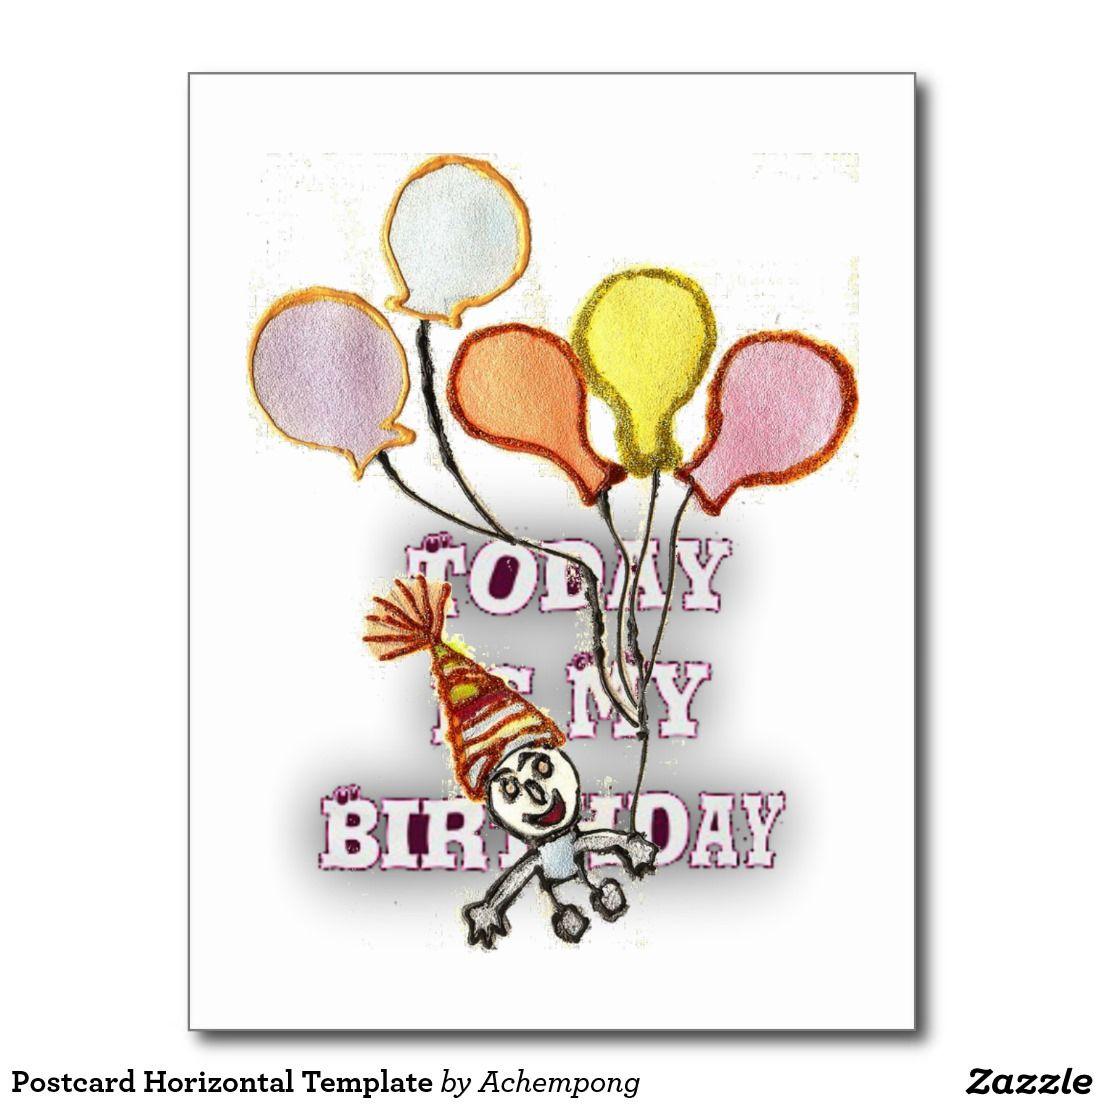 #Post-card #Horizontal #Template #Cards & #Invitations #Postcard #Hakuna #Matata #Greeting #card #Today #Is #My #Birthday #Postcards